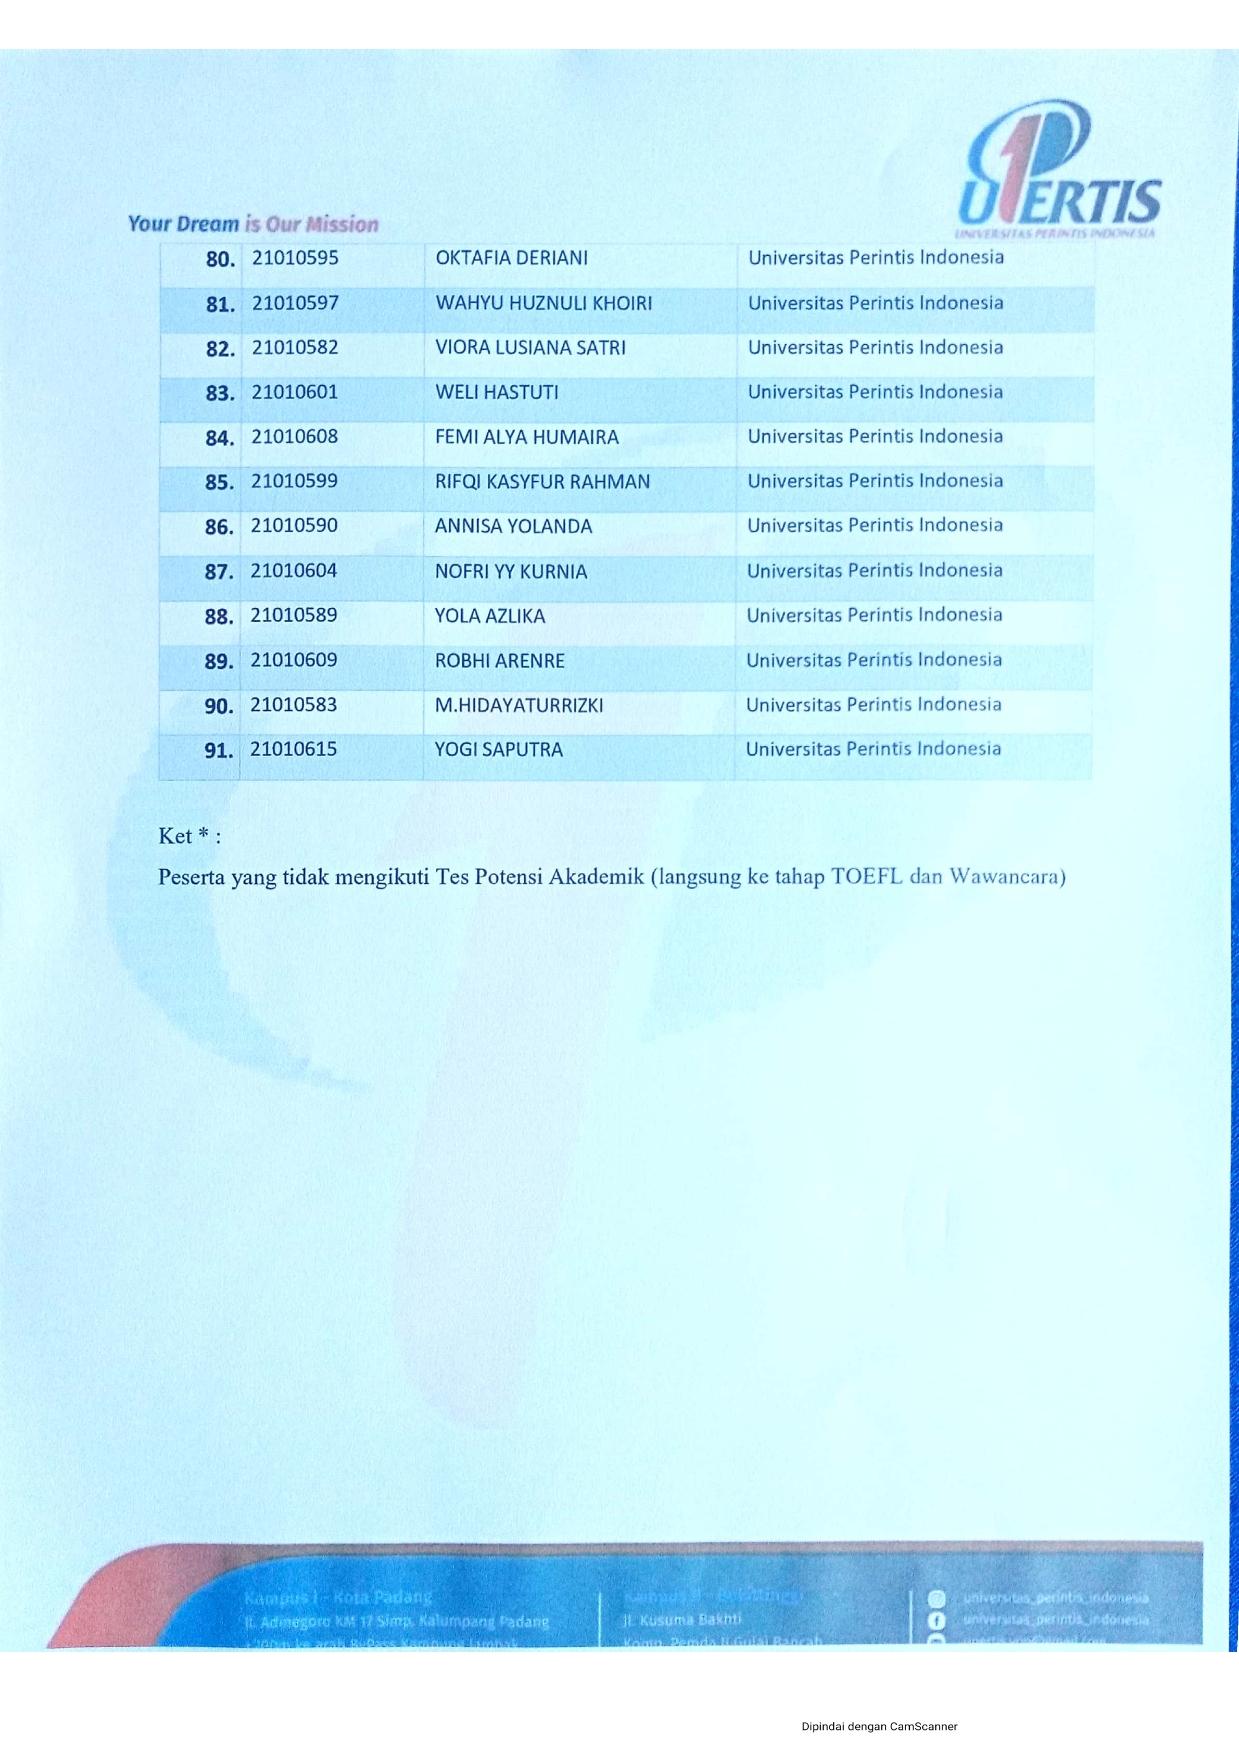 PENGUMUMAN ADMINISTRASI PMB APOTEKER 29_005